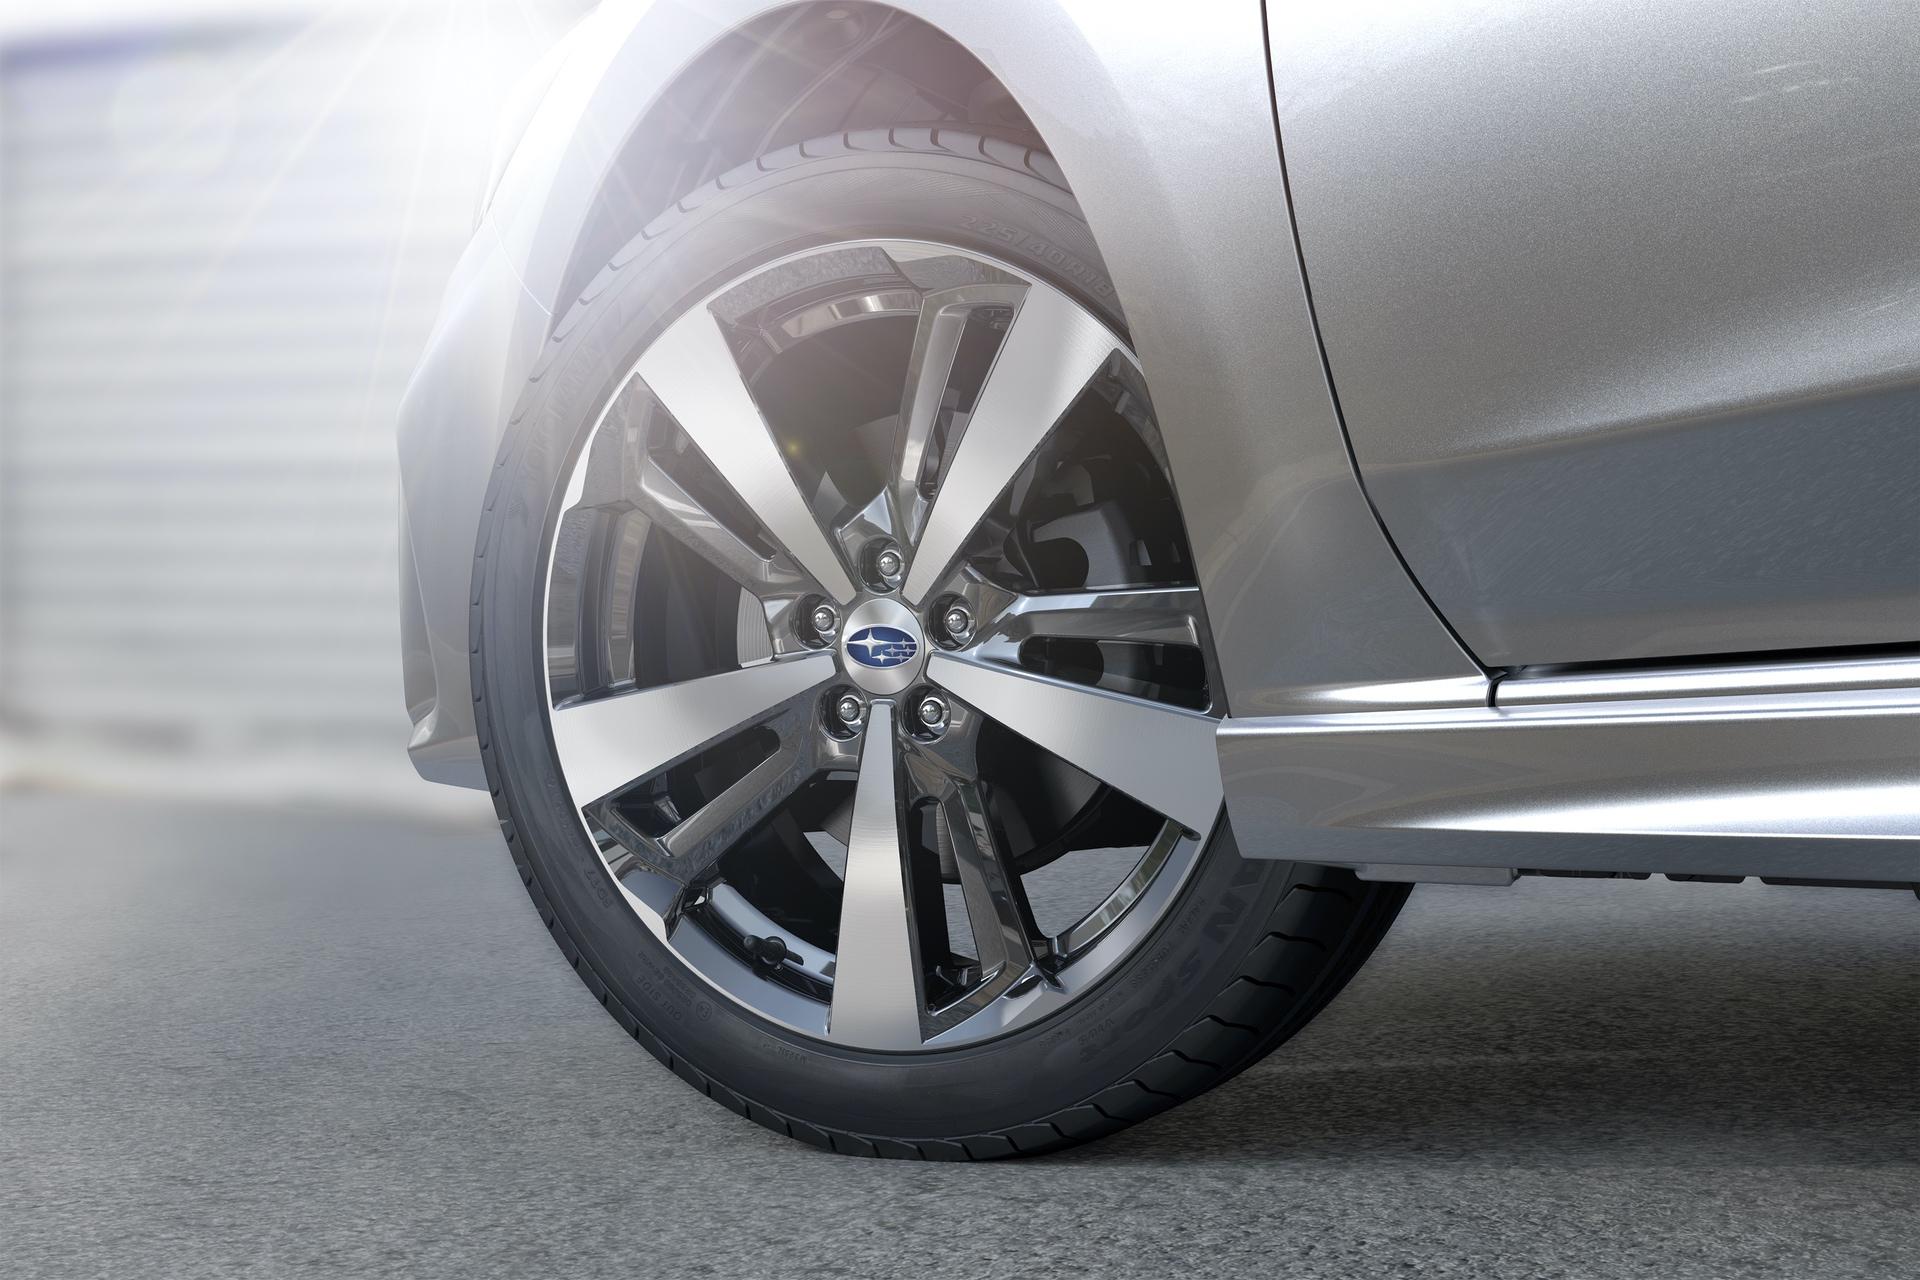 First_Drive_Subaru_Impreza_0024